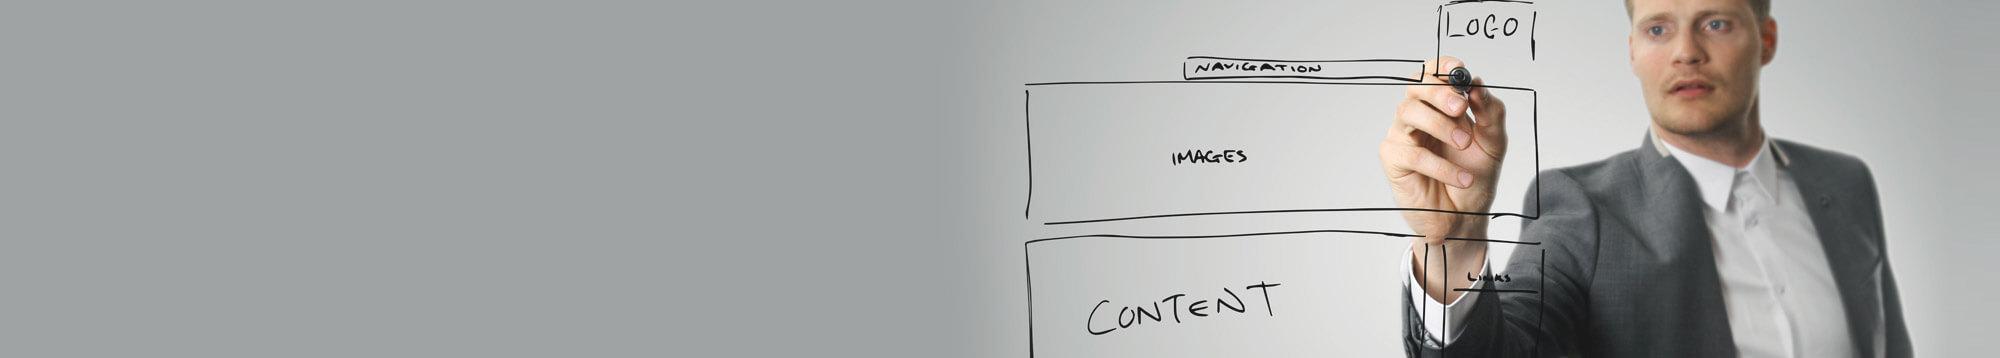 Create your unique looking website